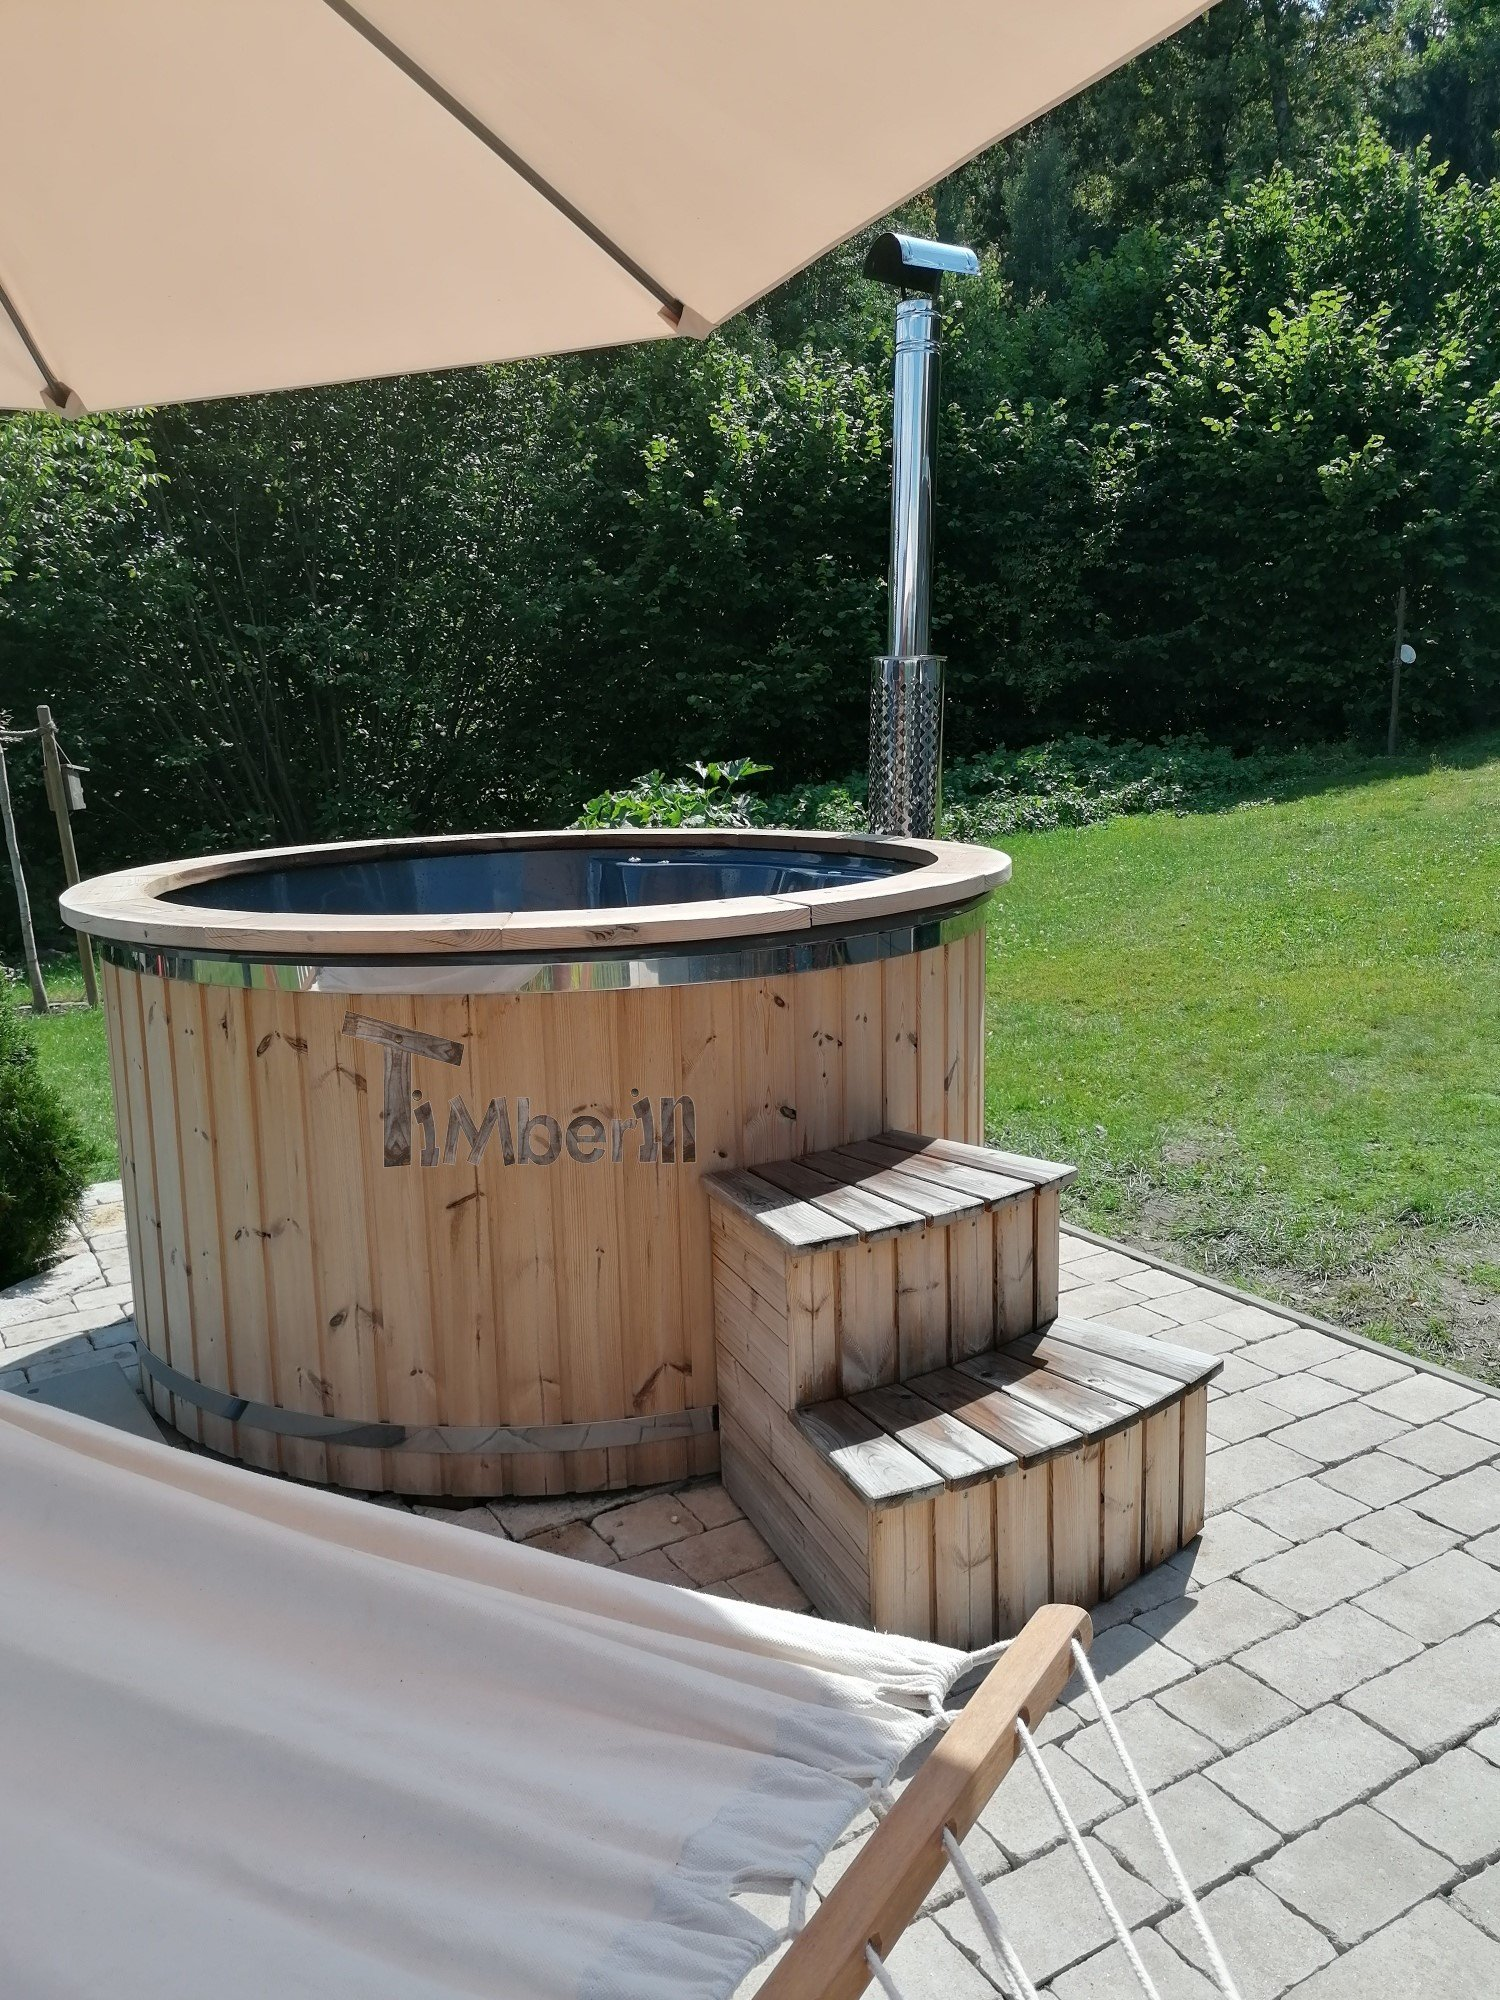 Badefass-gfk-Thermoholz-mit-integriertem-Ofen-Wellness-Royal-Paula-Sonnefeld-Deutschland-1 Bewertungen - Erfahrung TimberIN